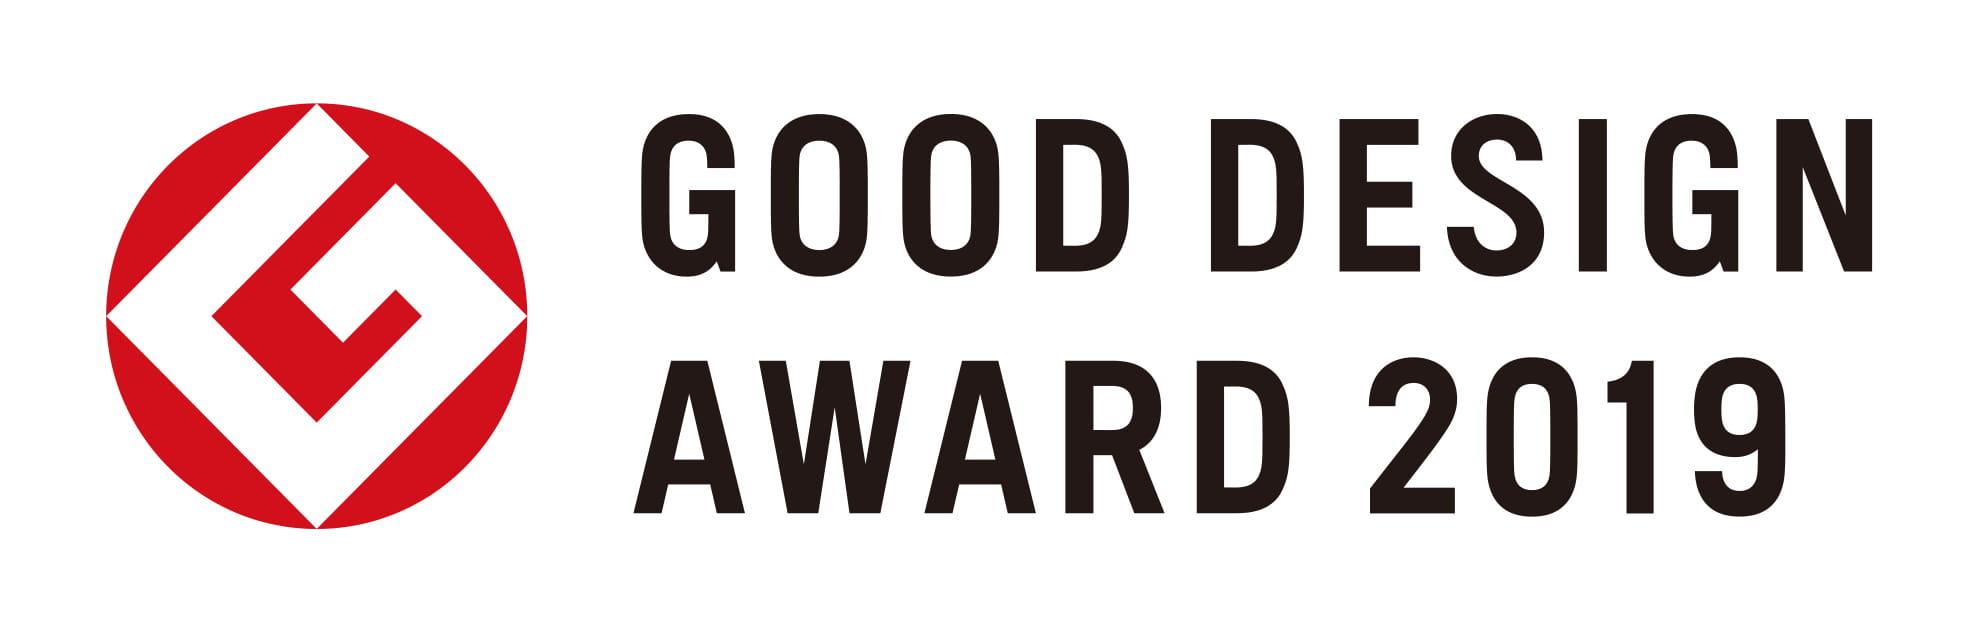 Good Design Award Logo 2019